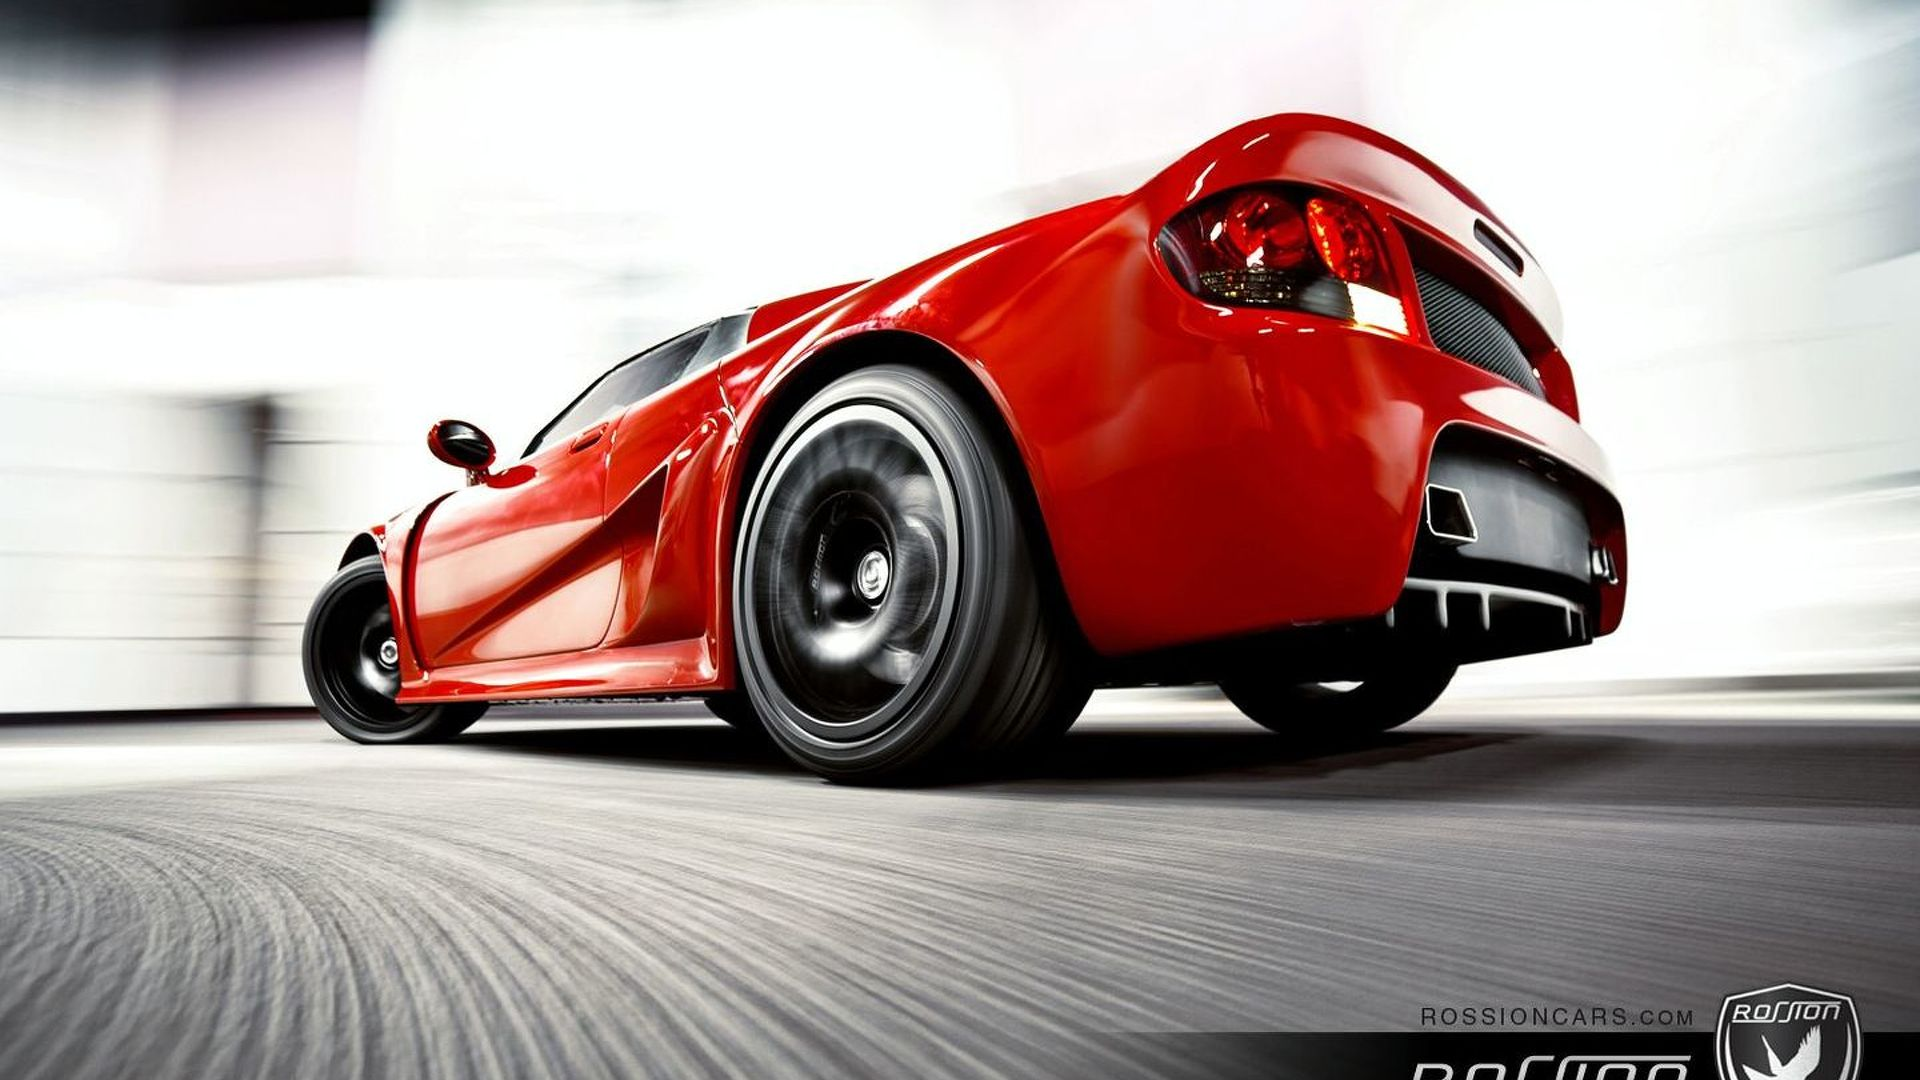 Rossion Q1 American Supercar Arrives in Ferrari Land [Video]